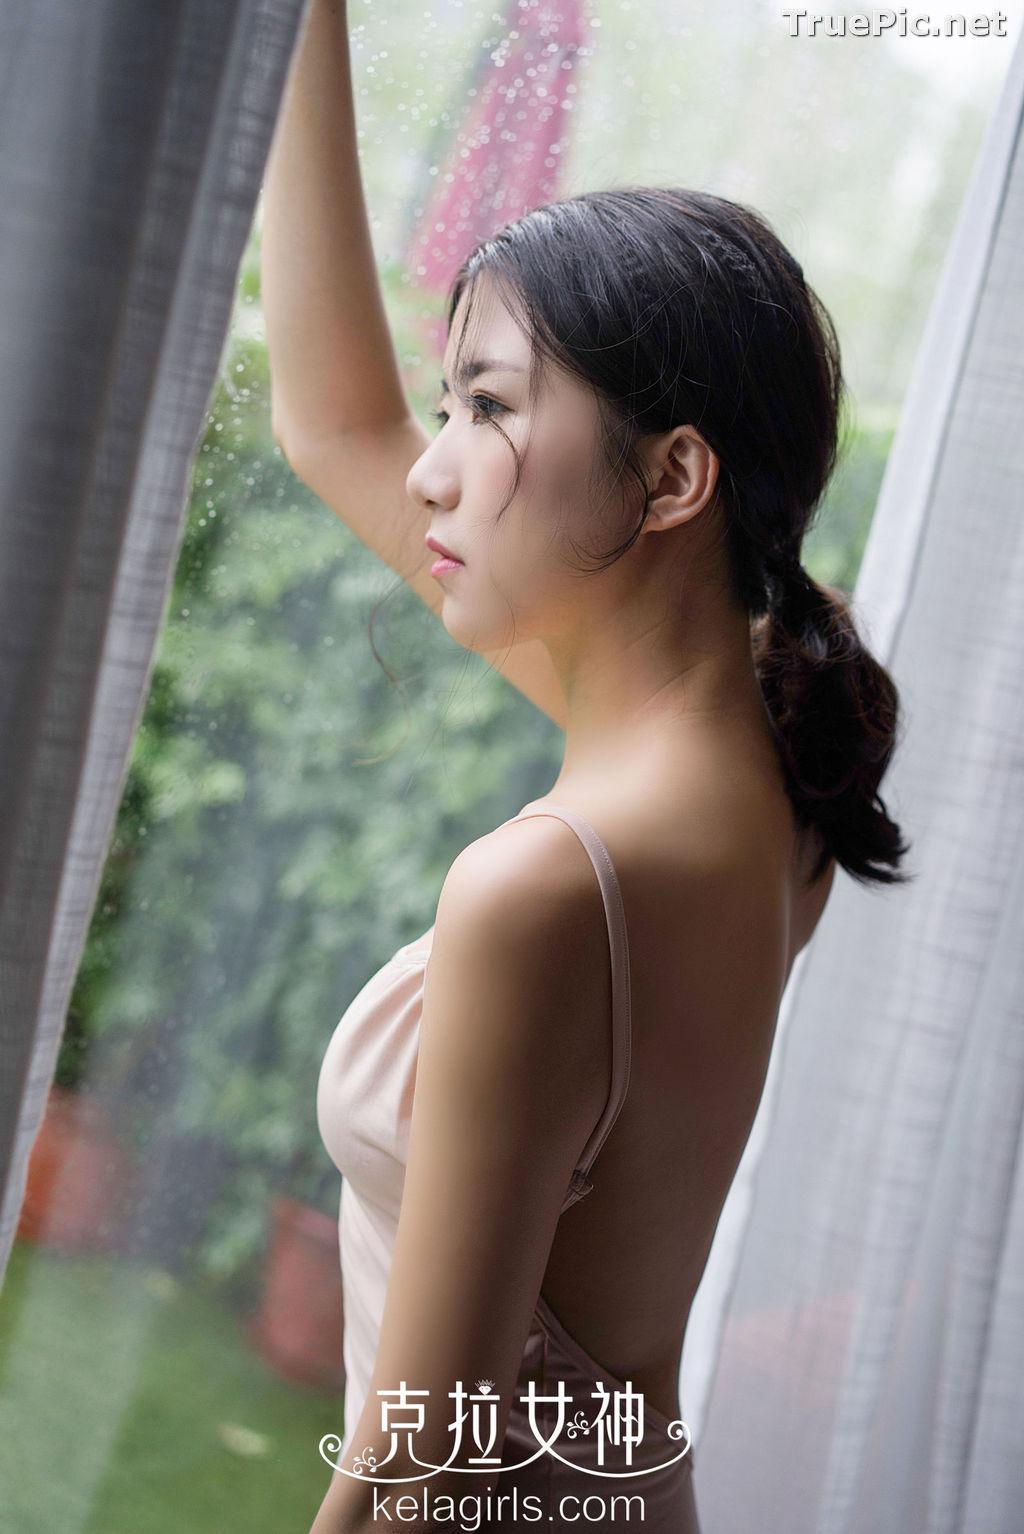 Image KelaGirls 克拉女神 – Chinese Model Ning Ning – Home School Girl Photo Album - TruePic.net - Picture-6